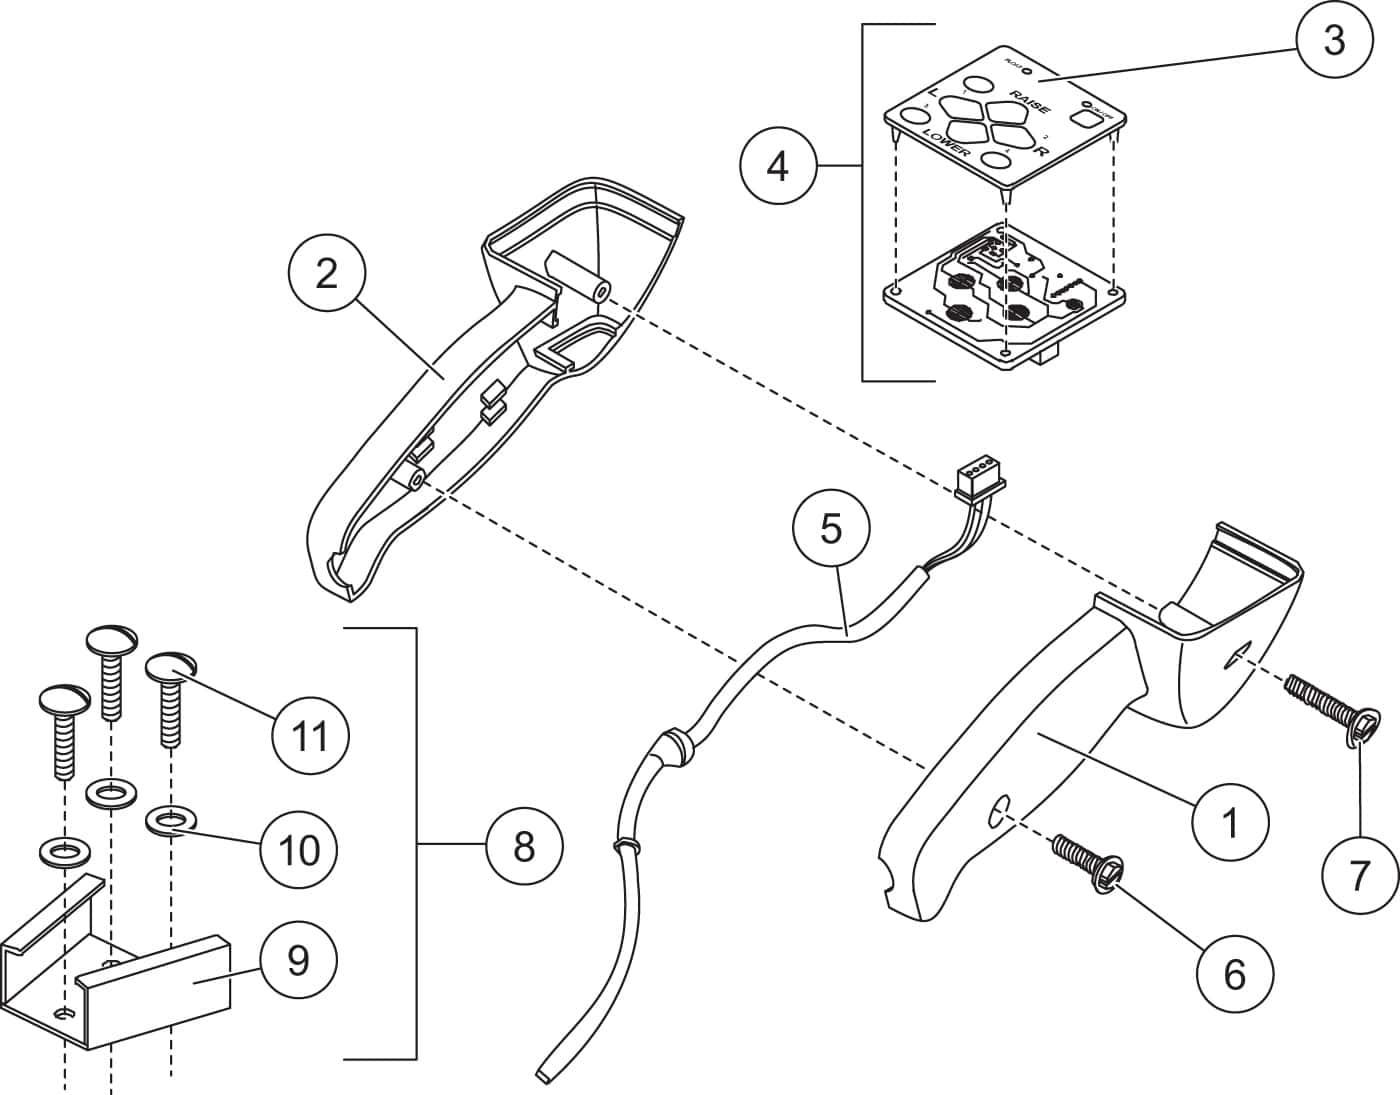 hight resolution of xv2 fish stik hand held control diagram